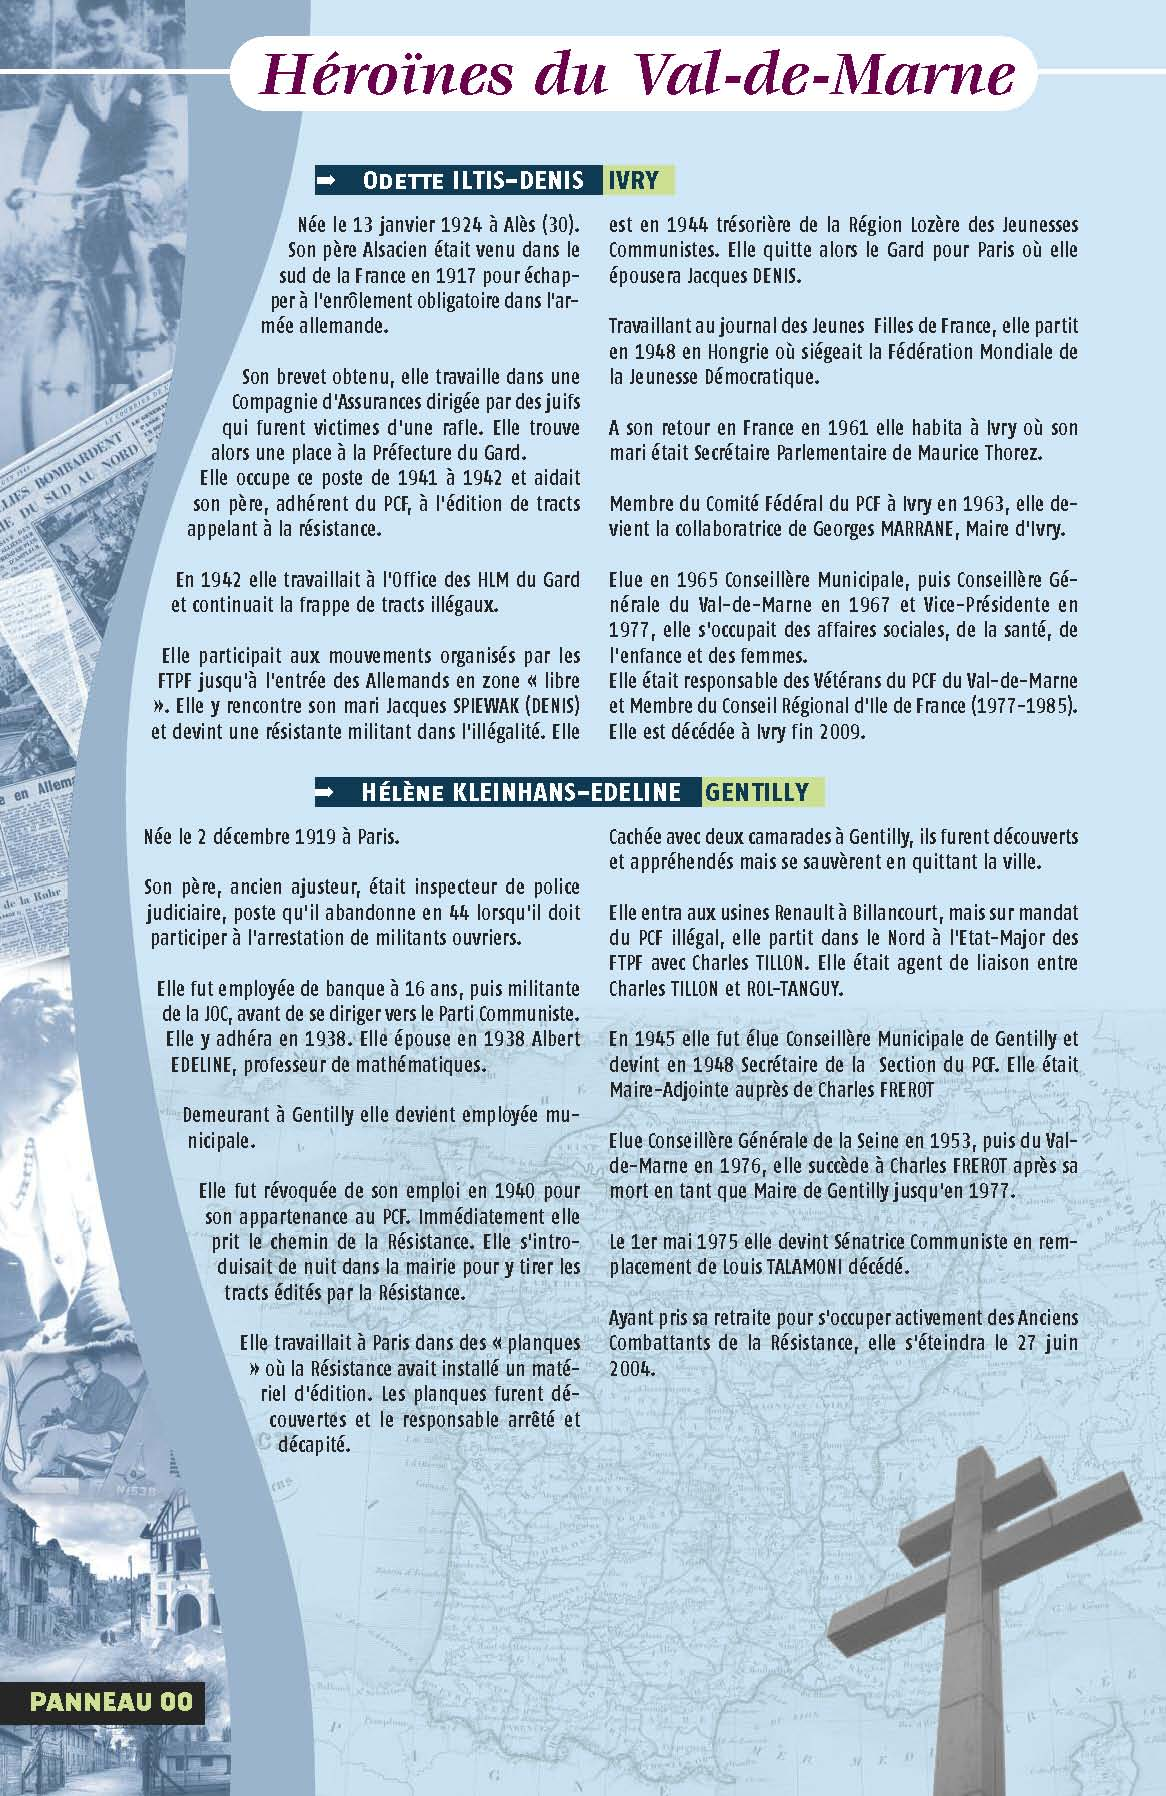 Pano12 15 page 1